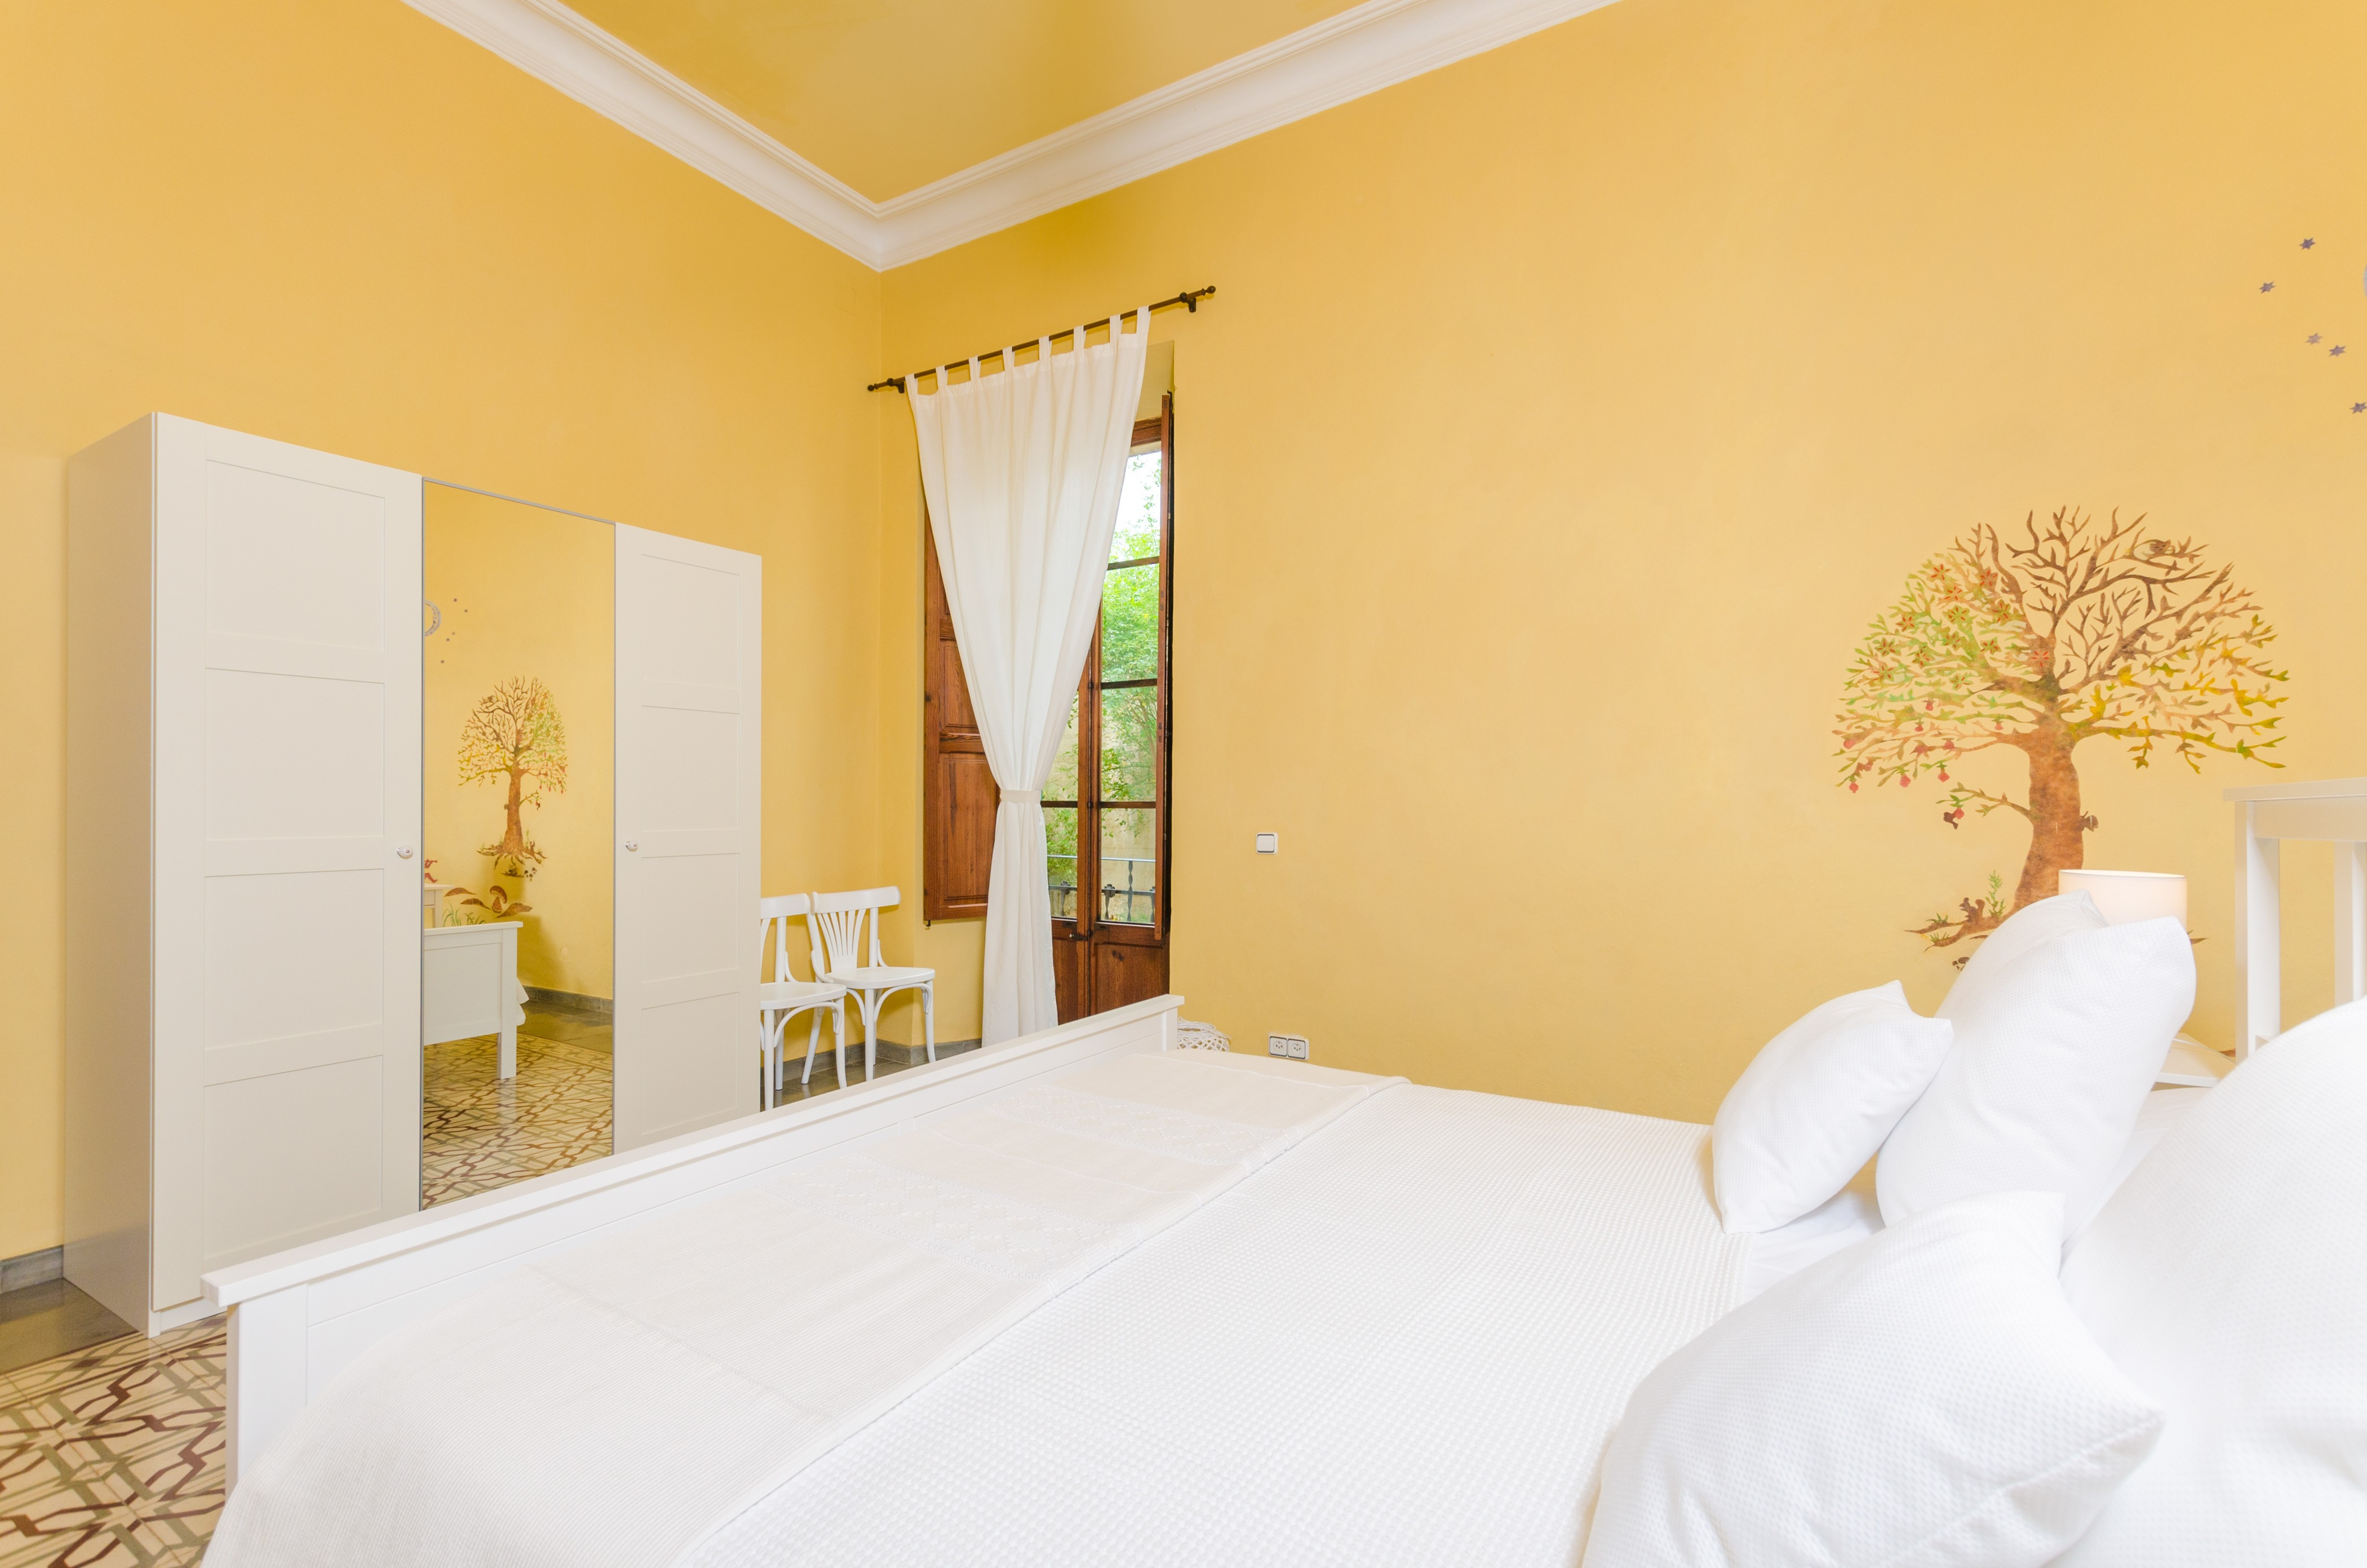 Maison de vacances CAS CONVIDATS (2435013), Alaro, Majorque, Iles Baléares, Espagne, image 33